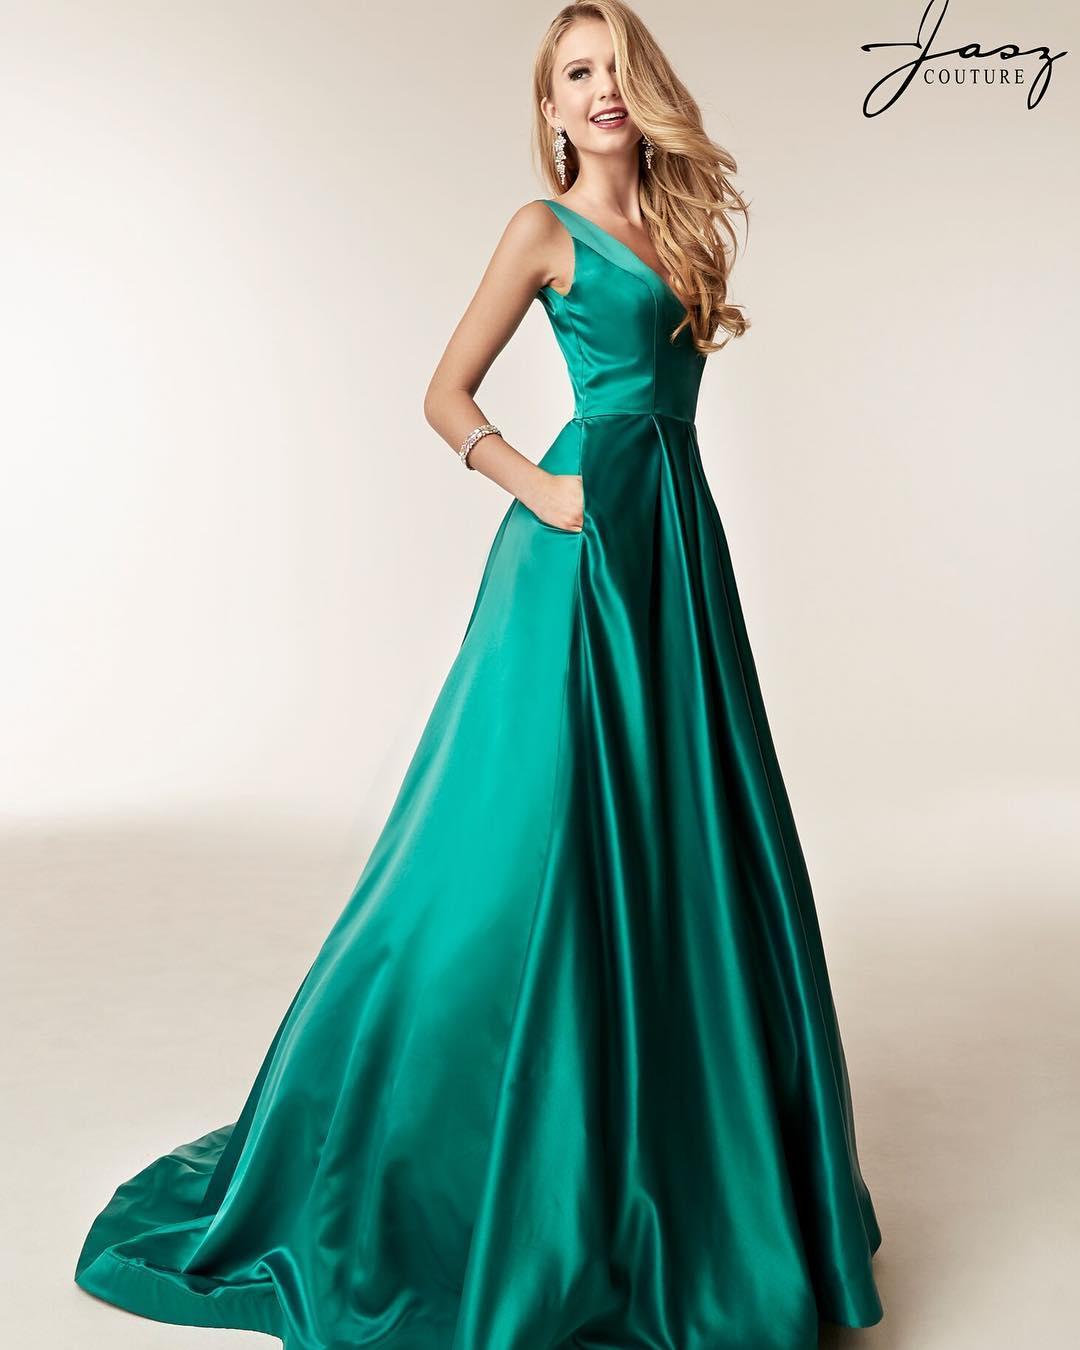 Princess V Neck Green Long Prom Dress with Pockets · modsele ...